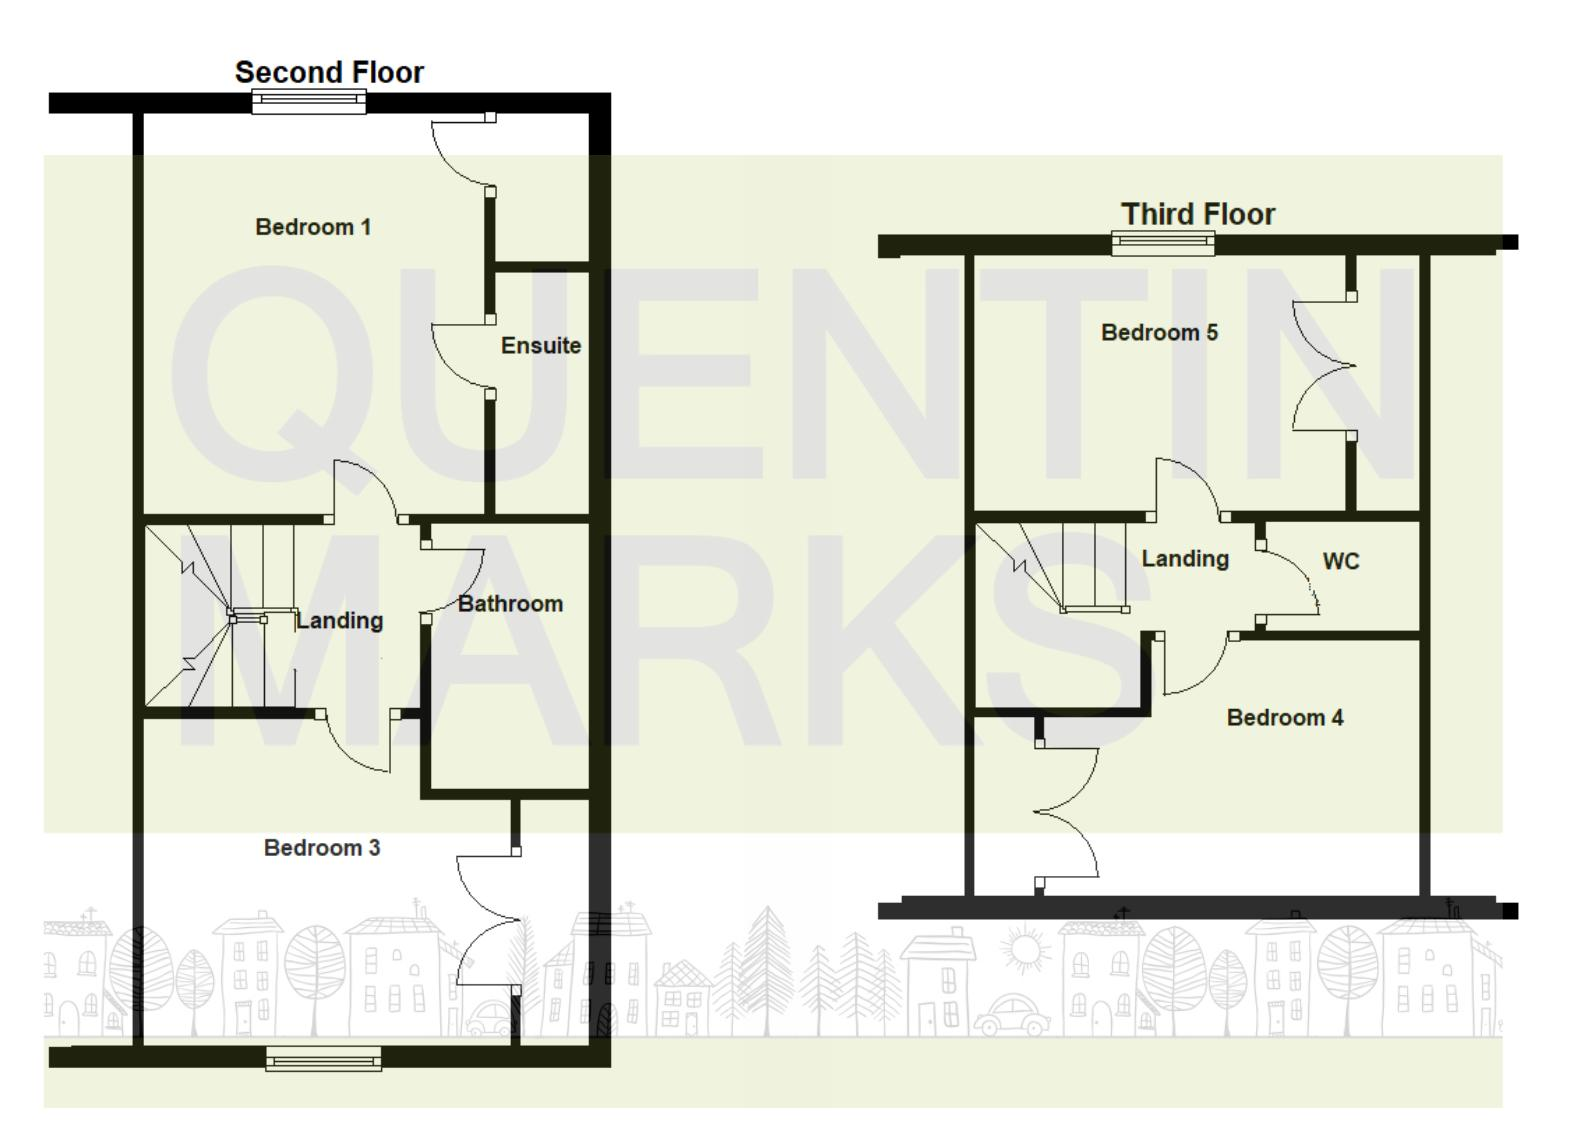 Second & Third Floors